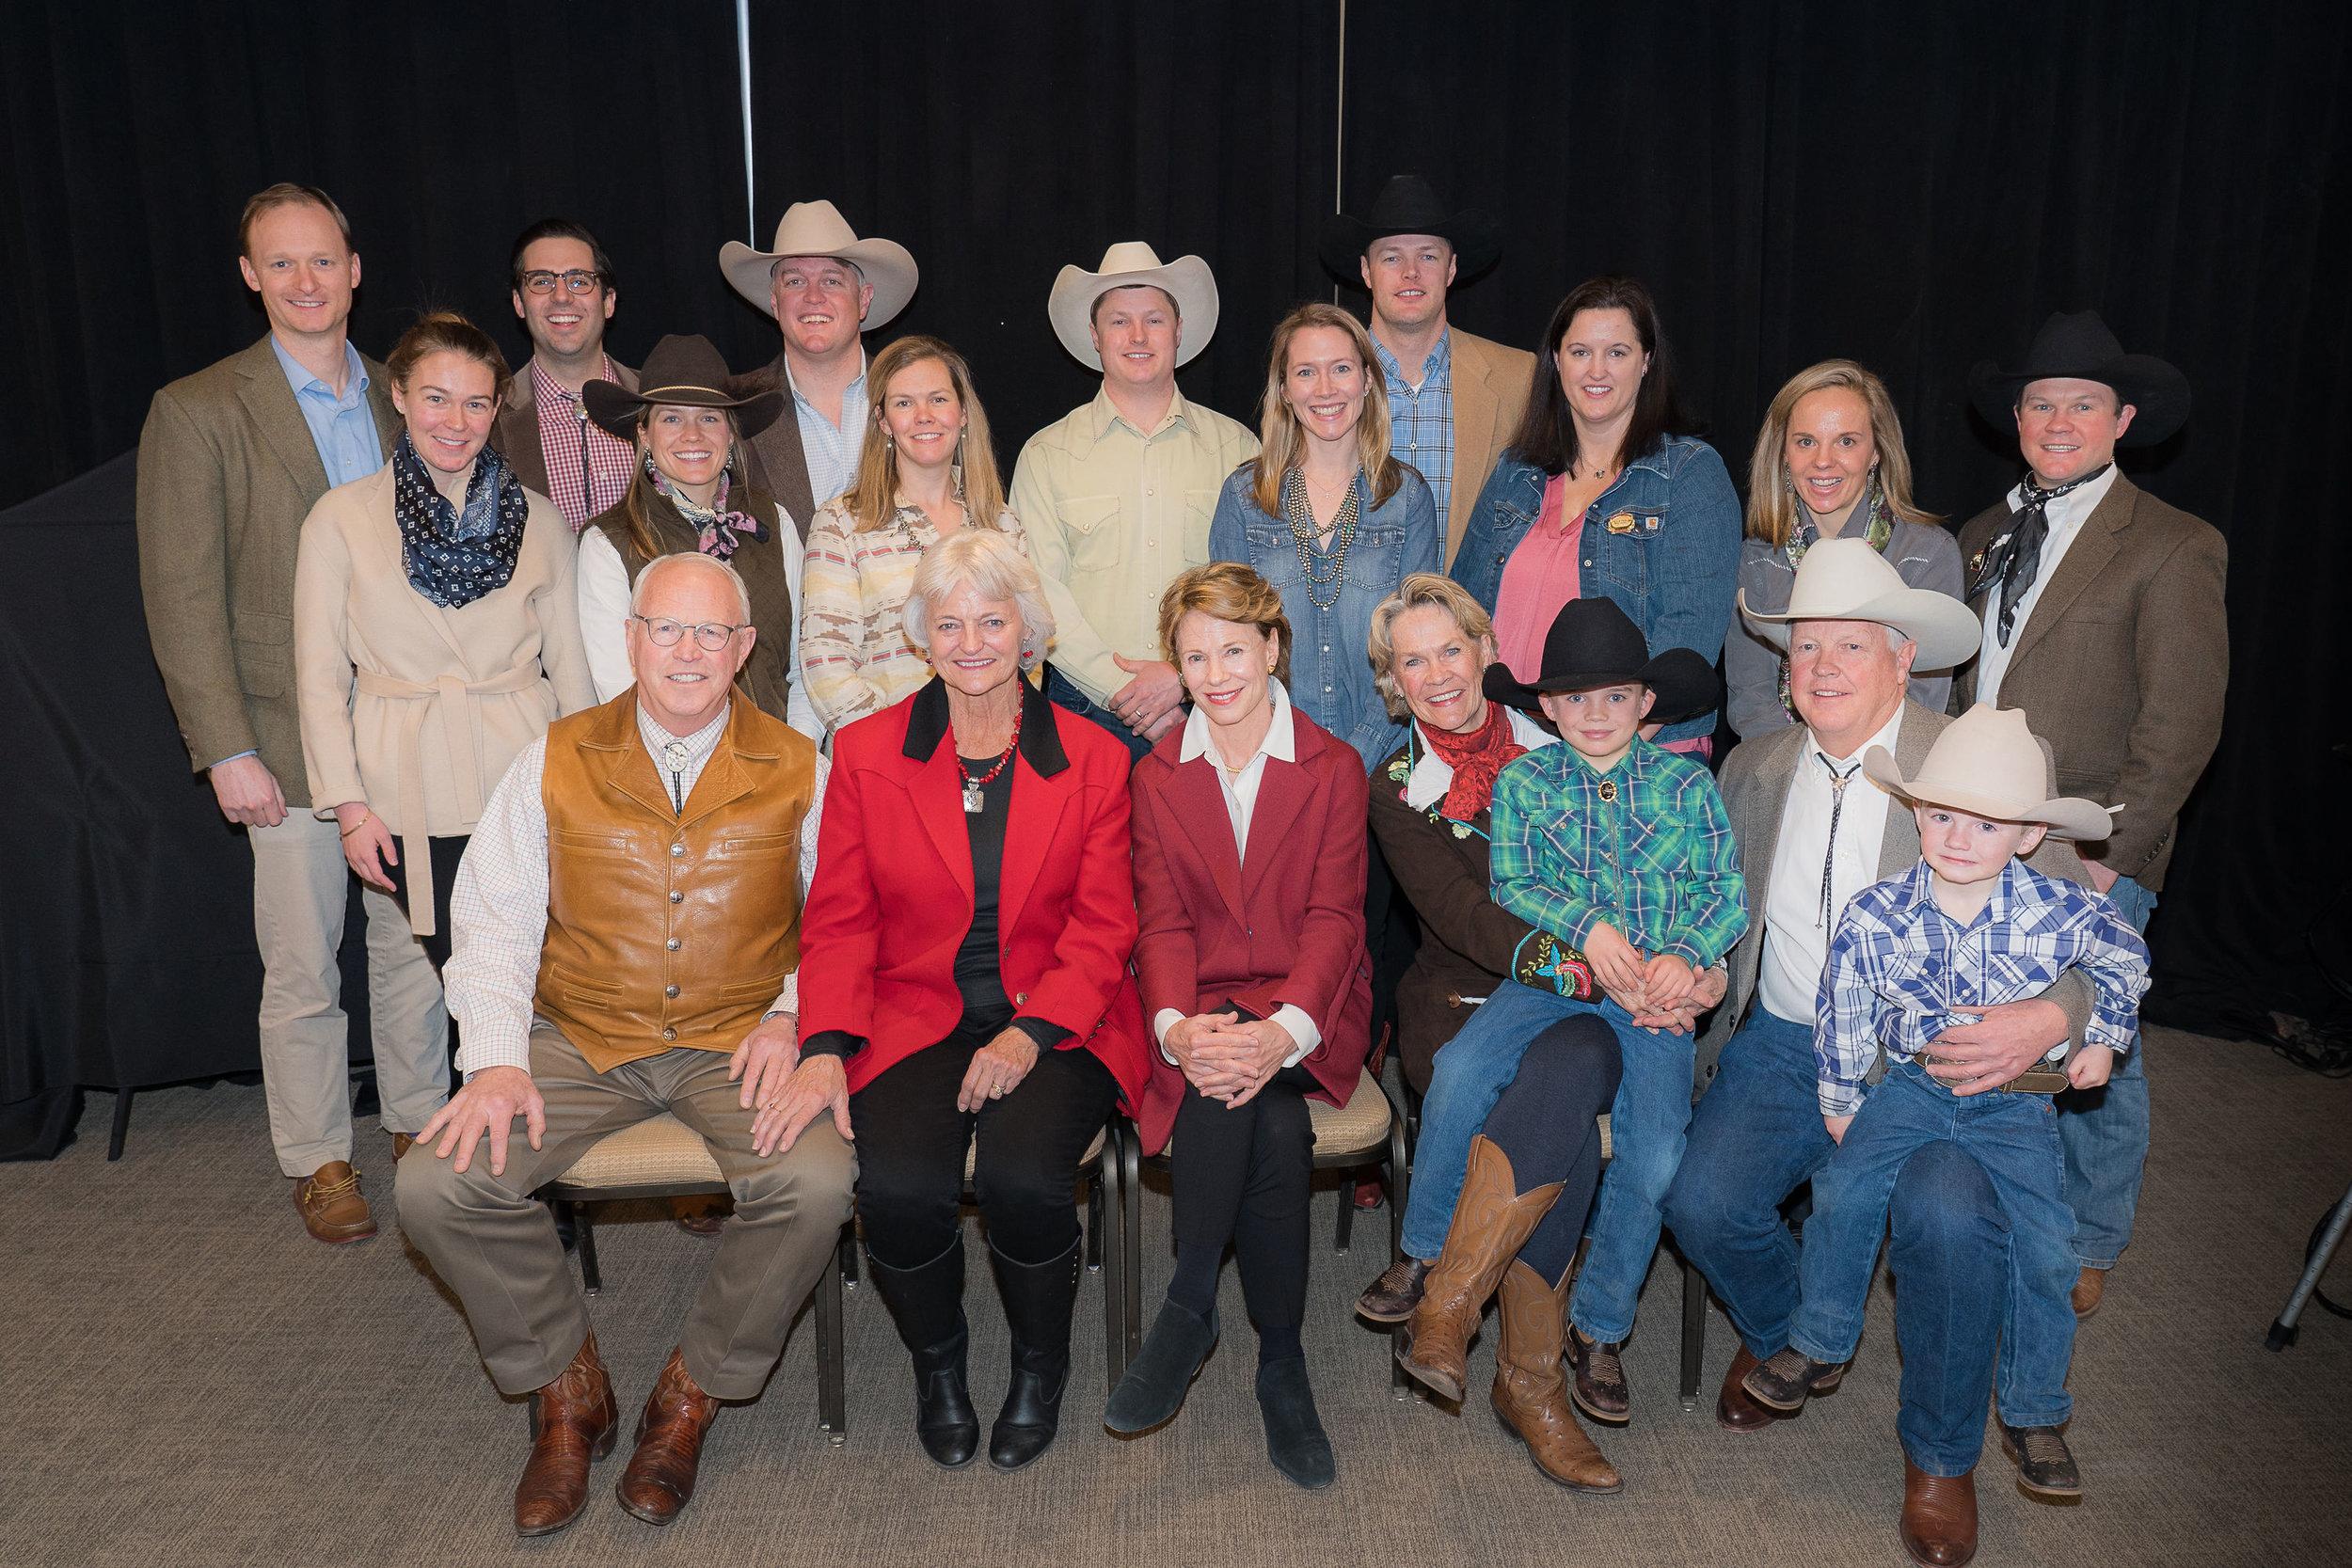 Family Photo at Stock Show.jpg